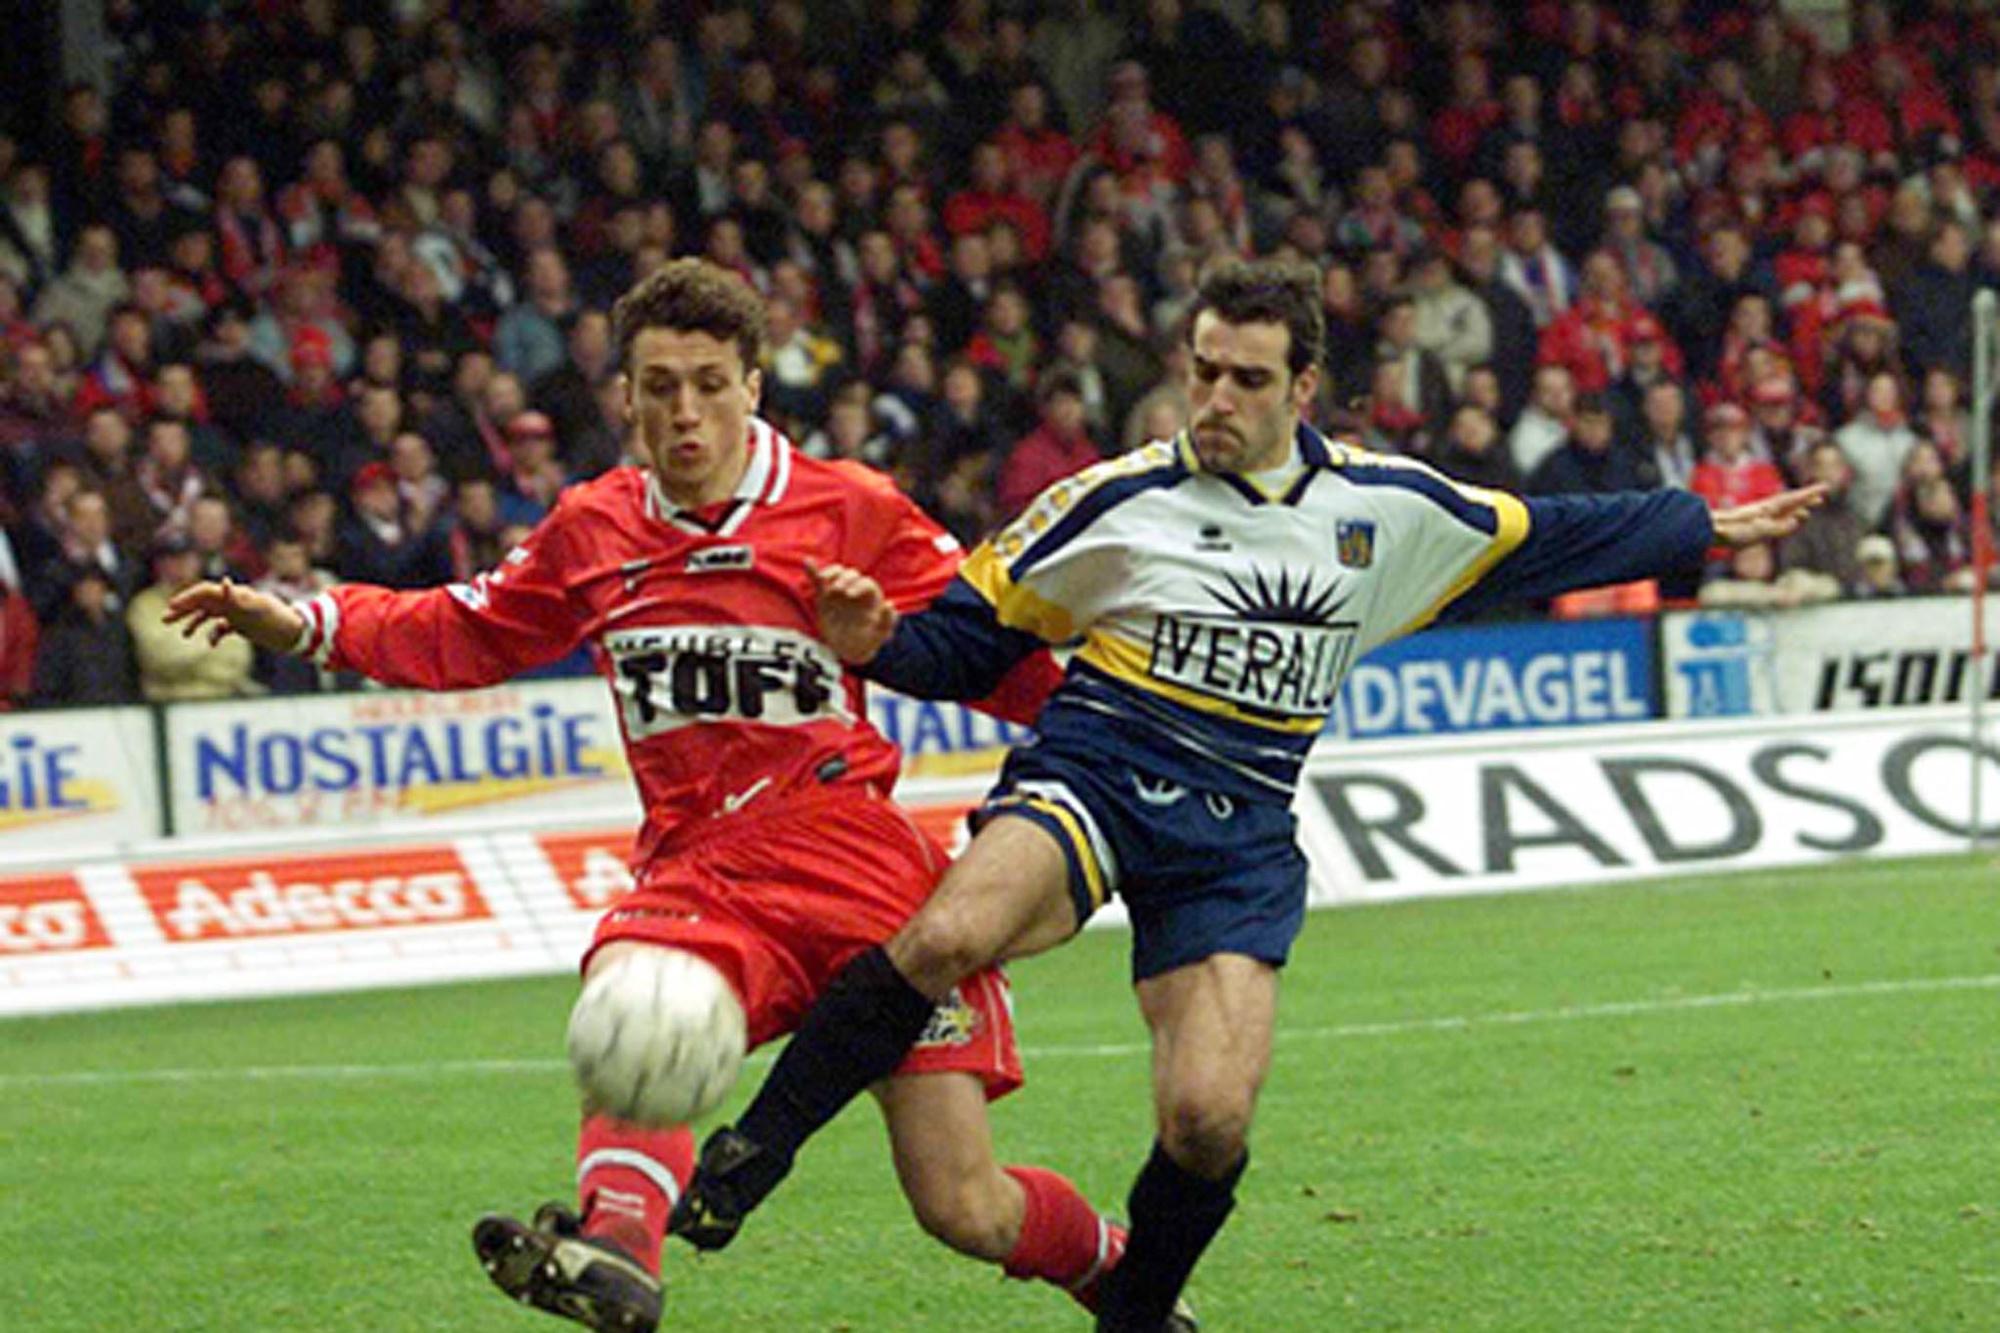 Un duel acharné entre Toni Brogno et Alexandre Teklak., belga